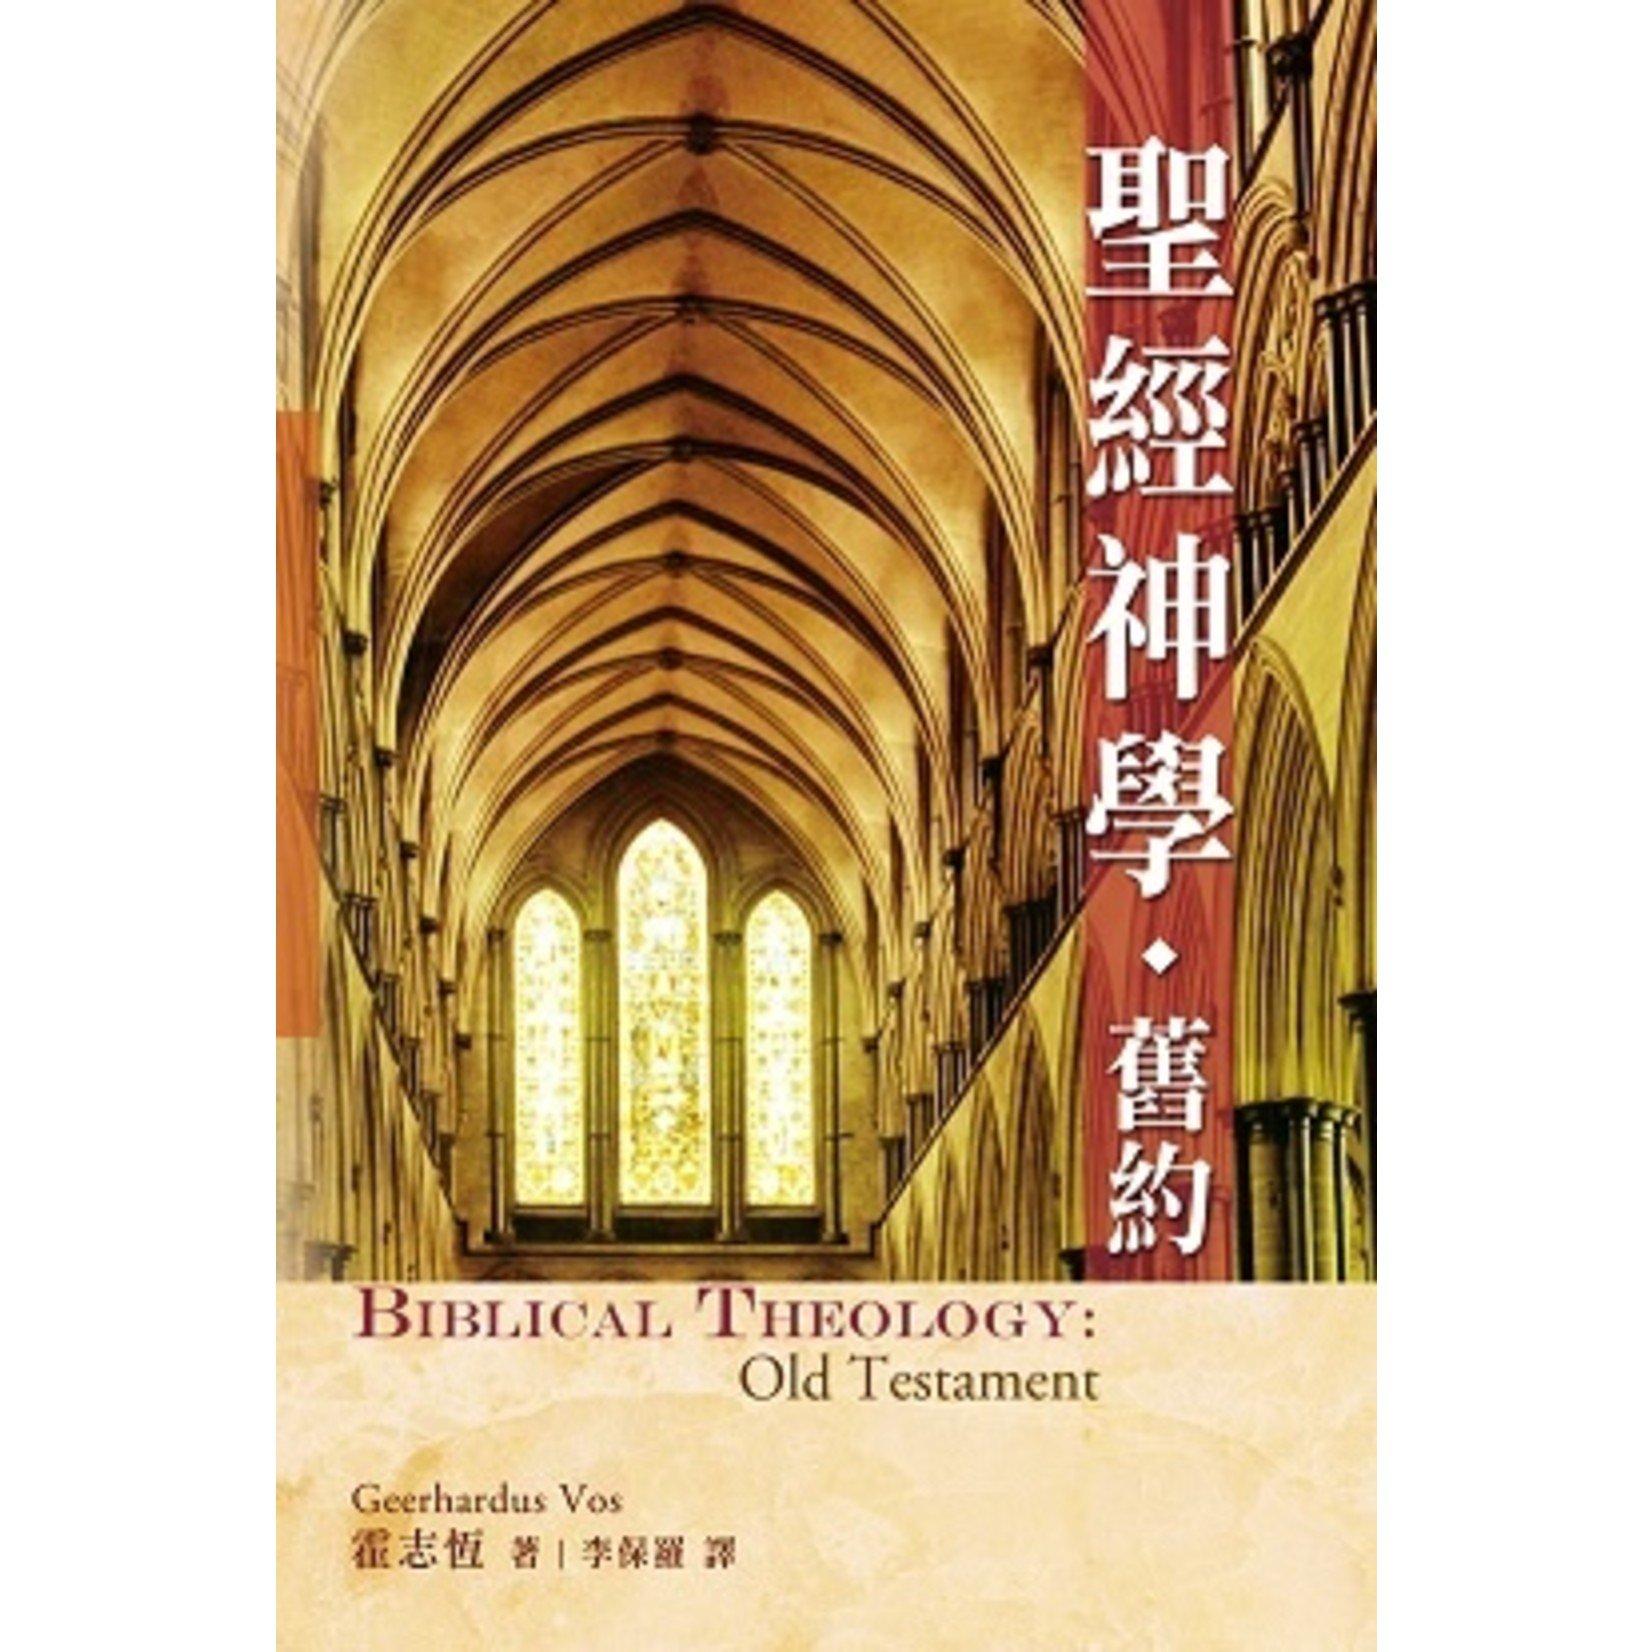 天道書樓 Tien Dao Publishing House 聖經神學:舊約 Biblical Theology : Old Testament